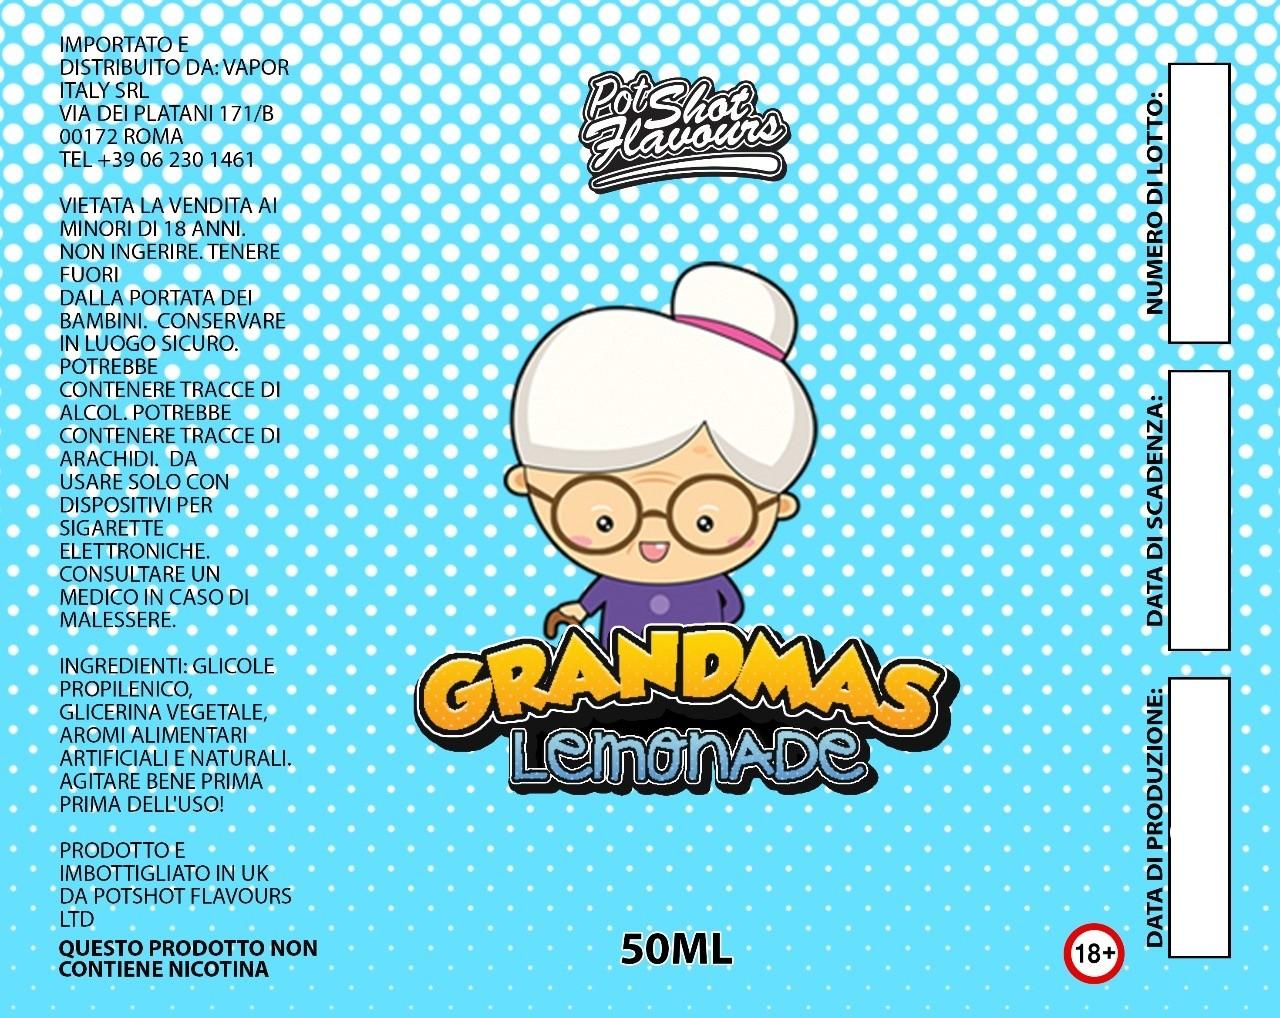 Pot Shot Flavour Grandmas Lemonade 50 ml Mix